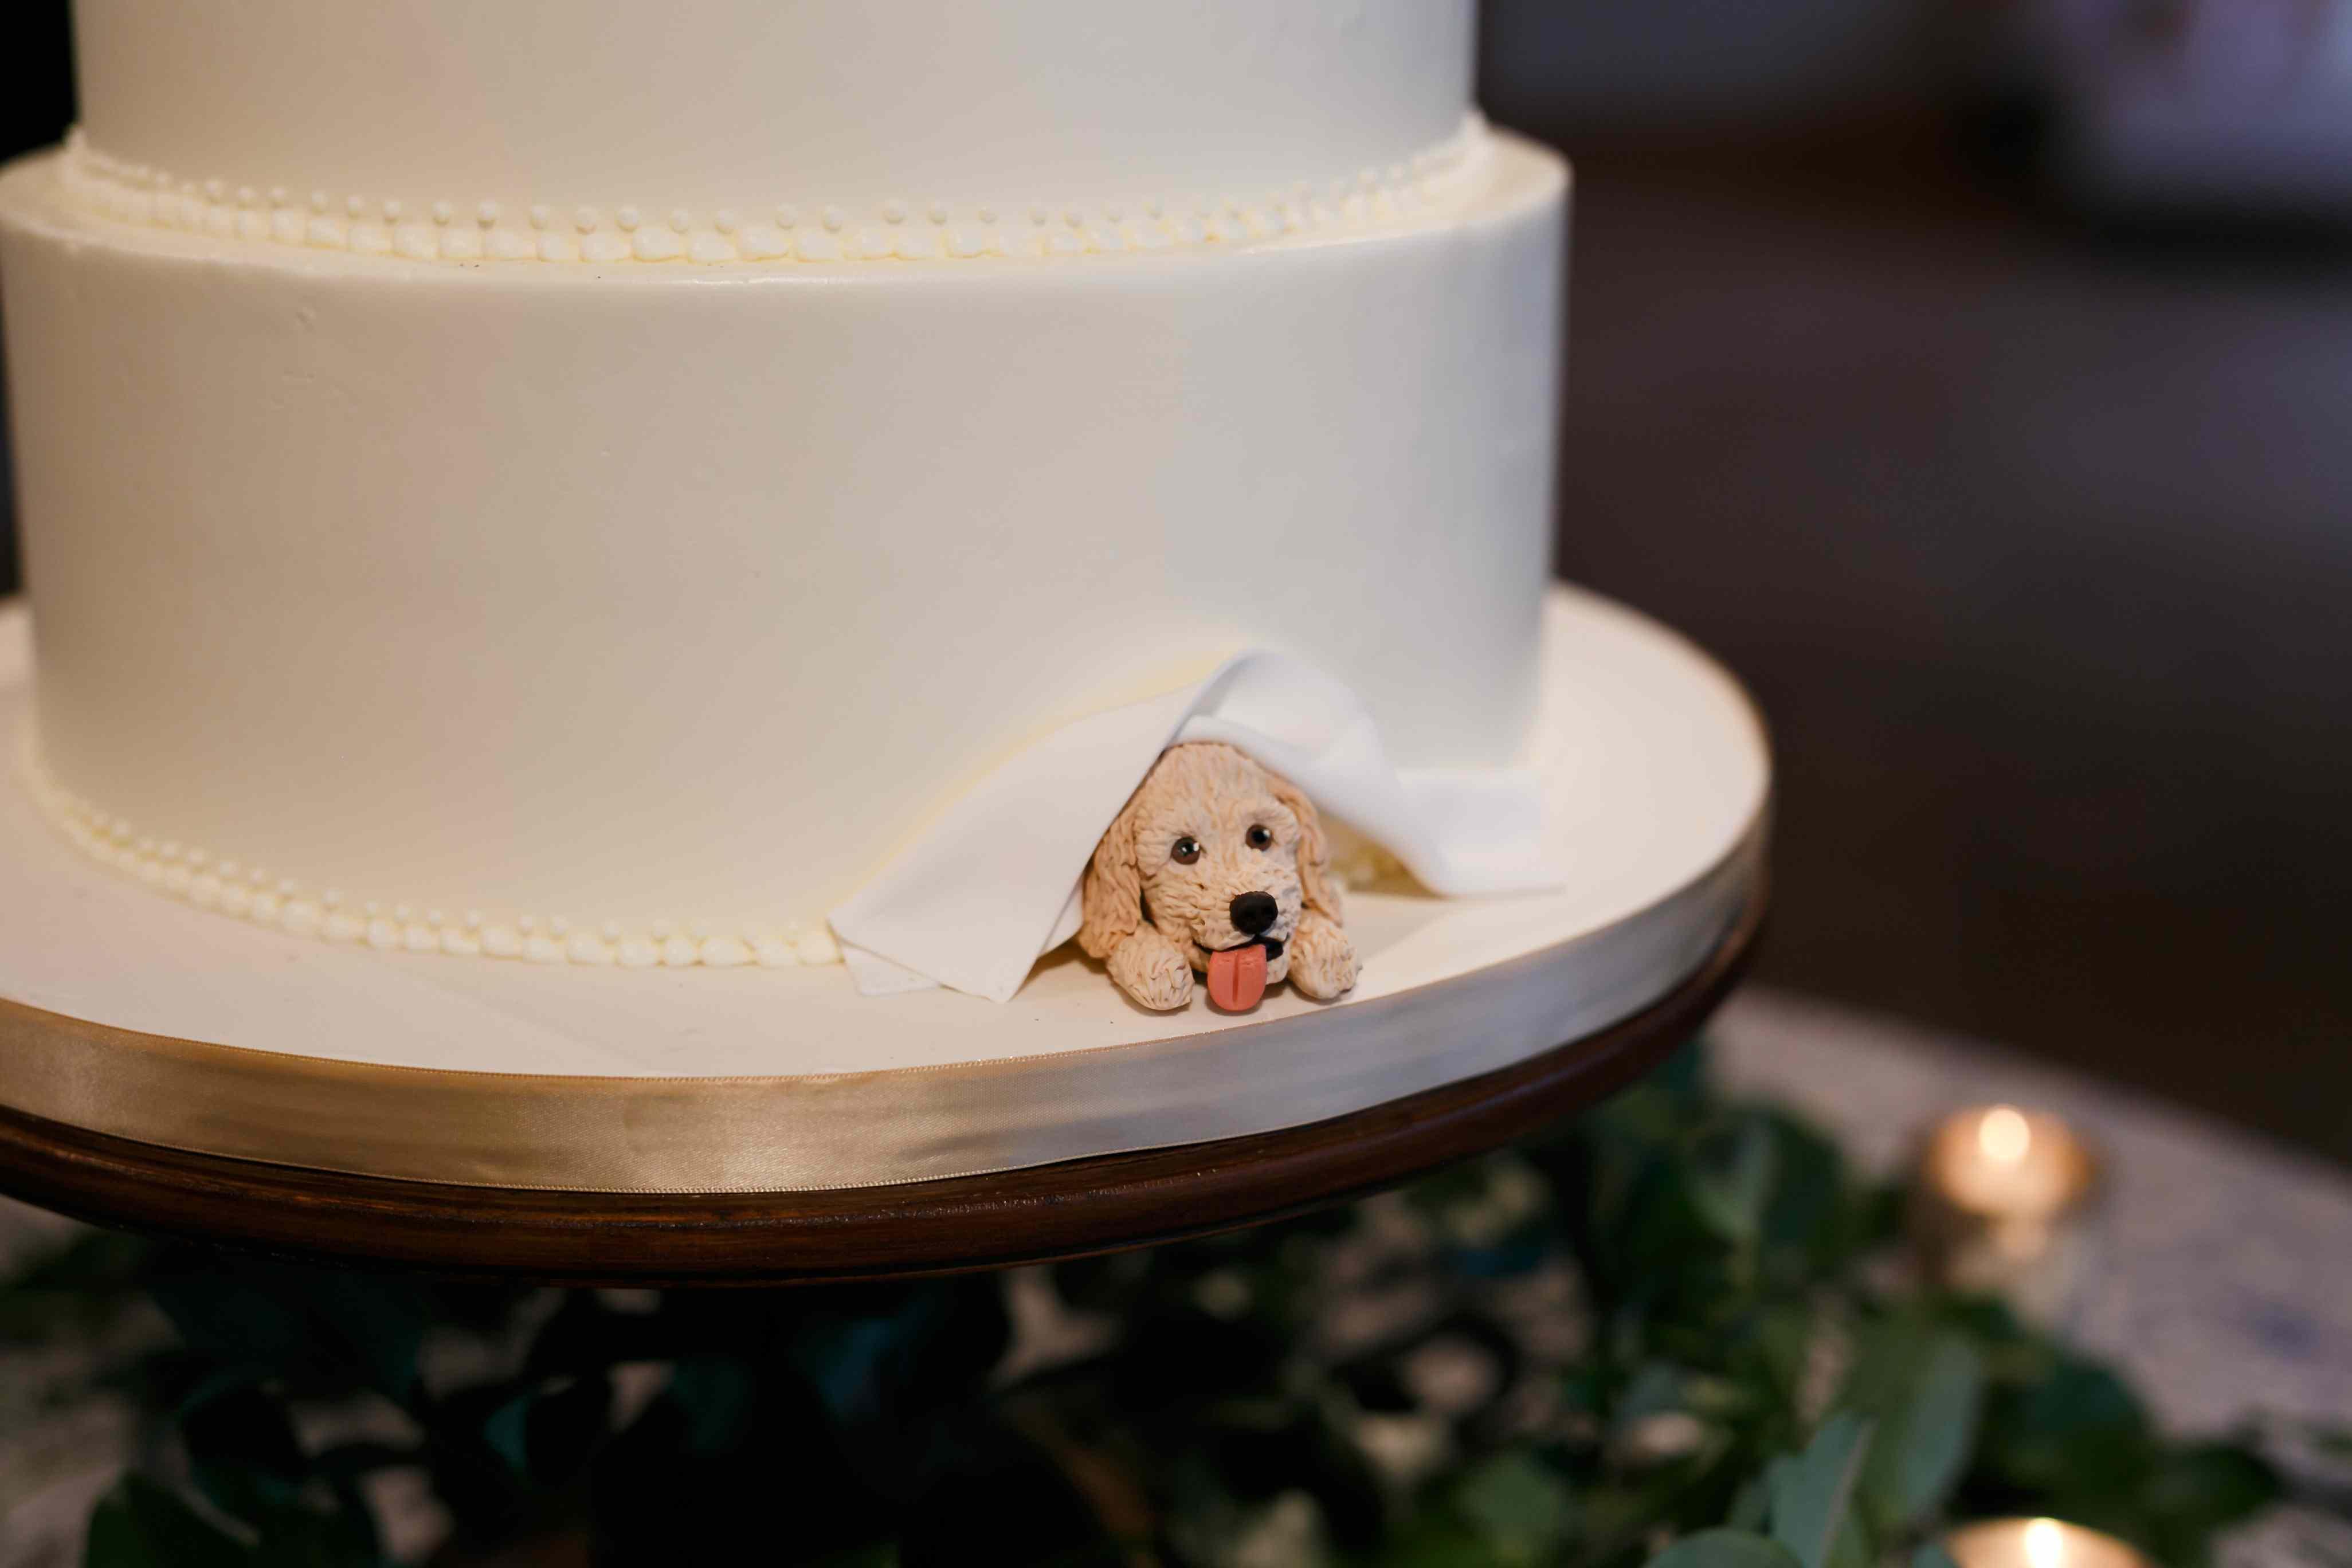 Sugar puppy peeking out of bottom of cake